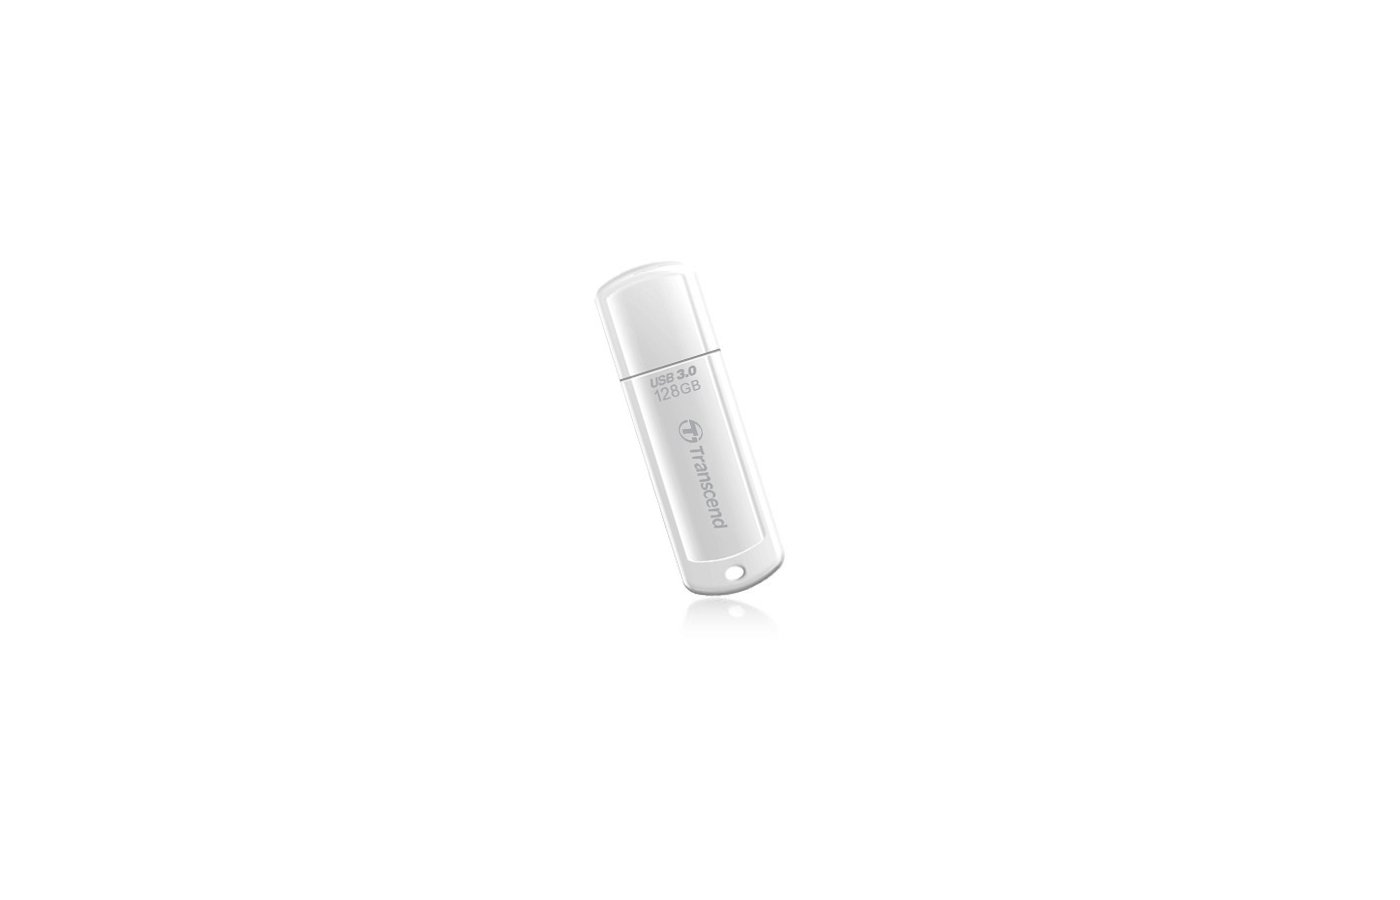 Флеш-диск Transcend 128Gb Jetflash 730 TS128GJF730 USB3.0 белый